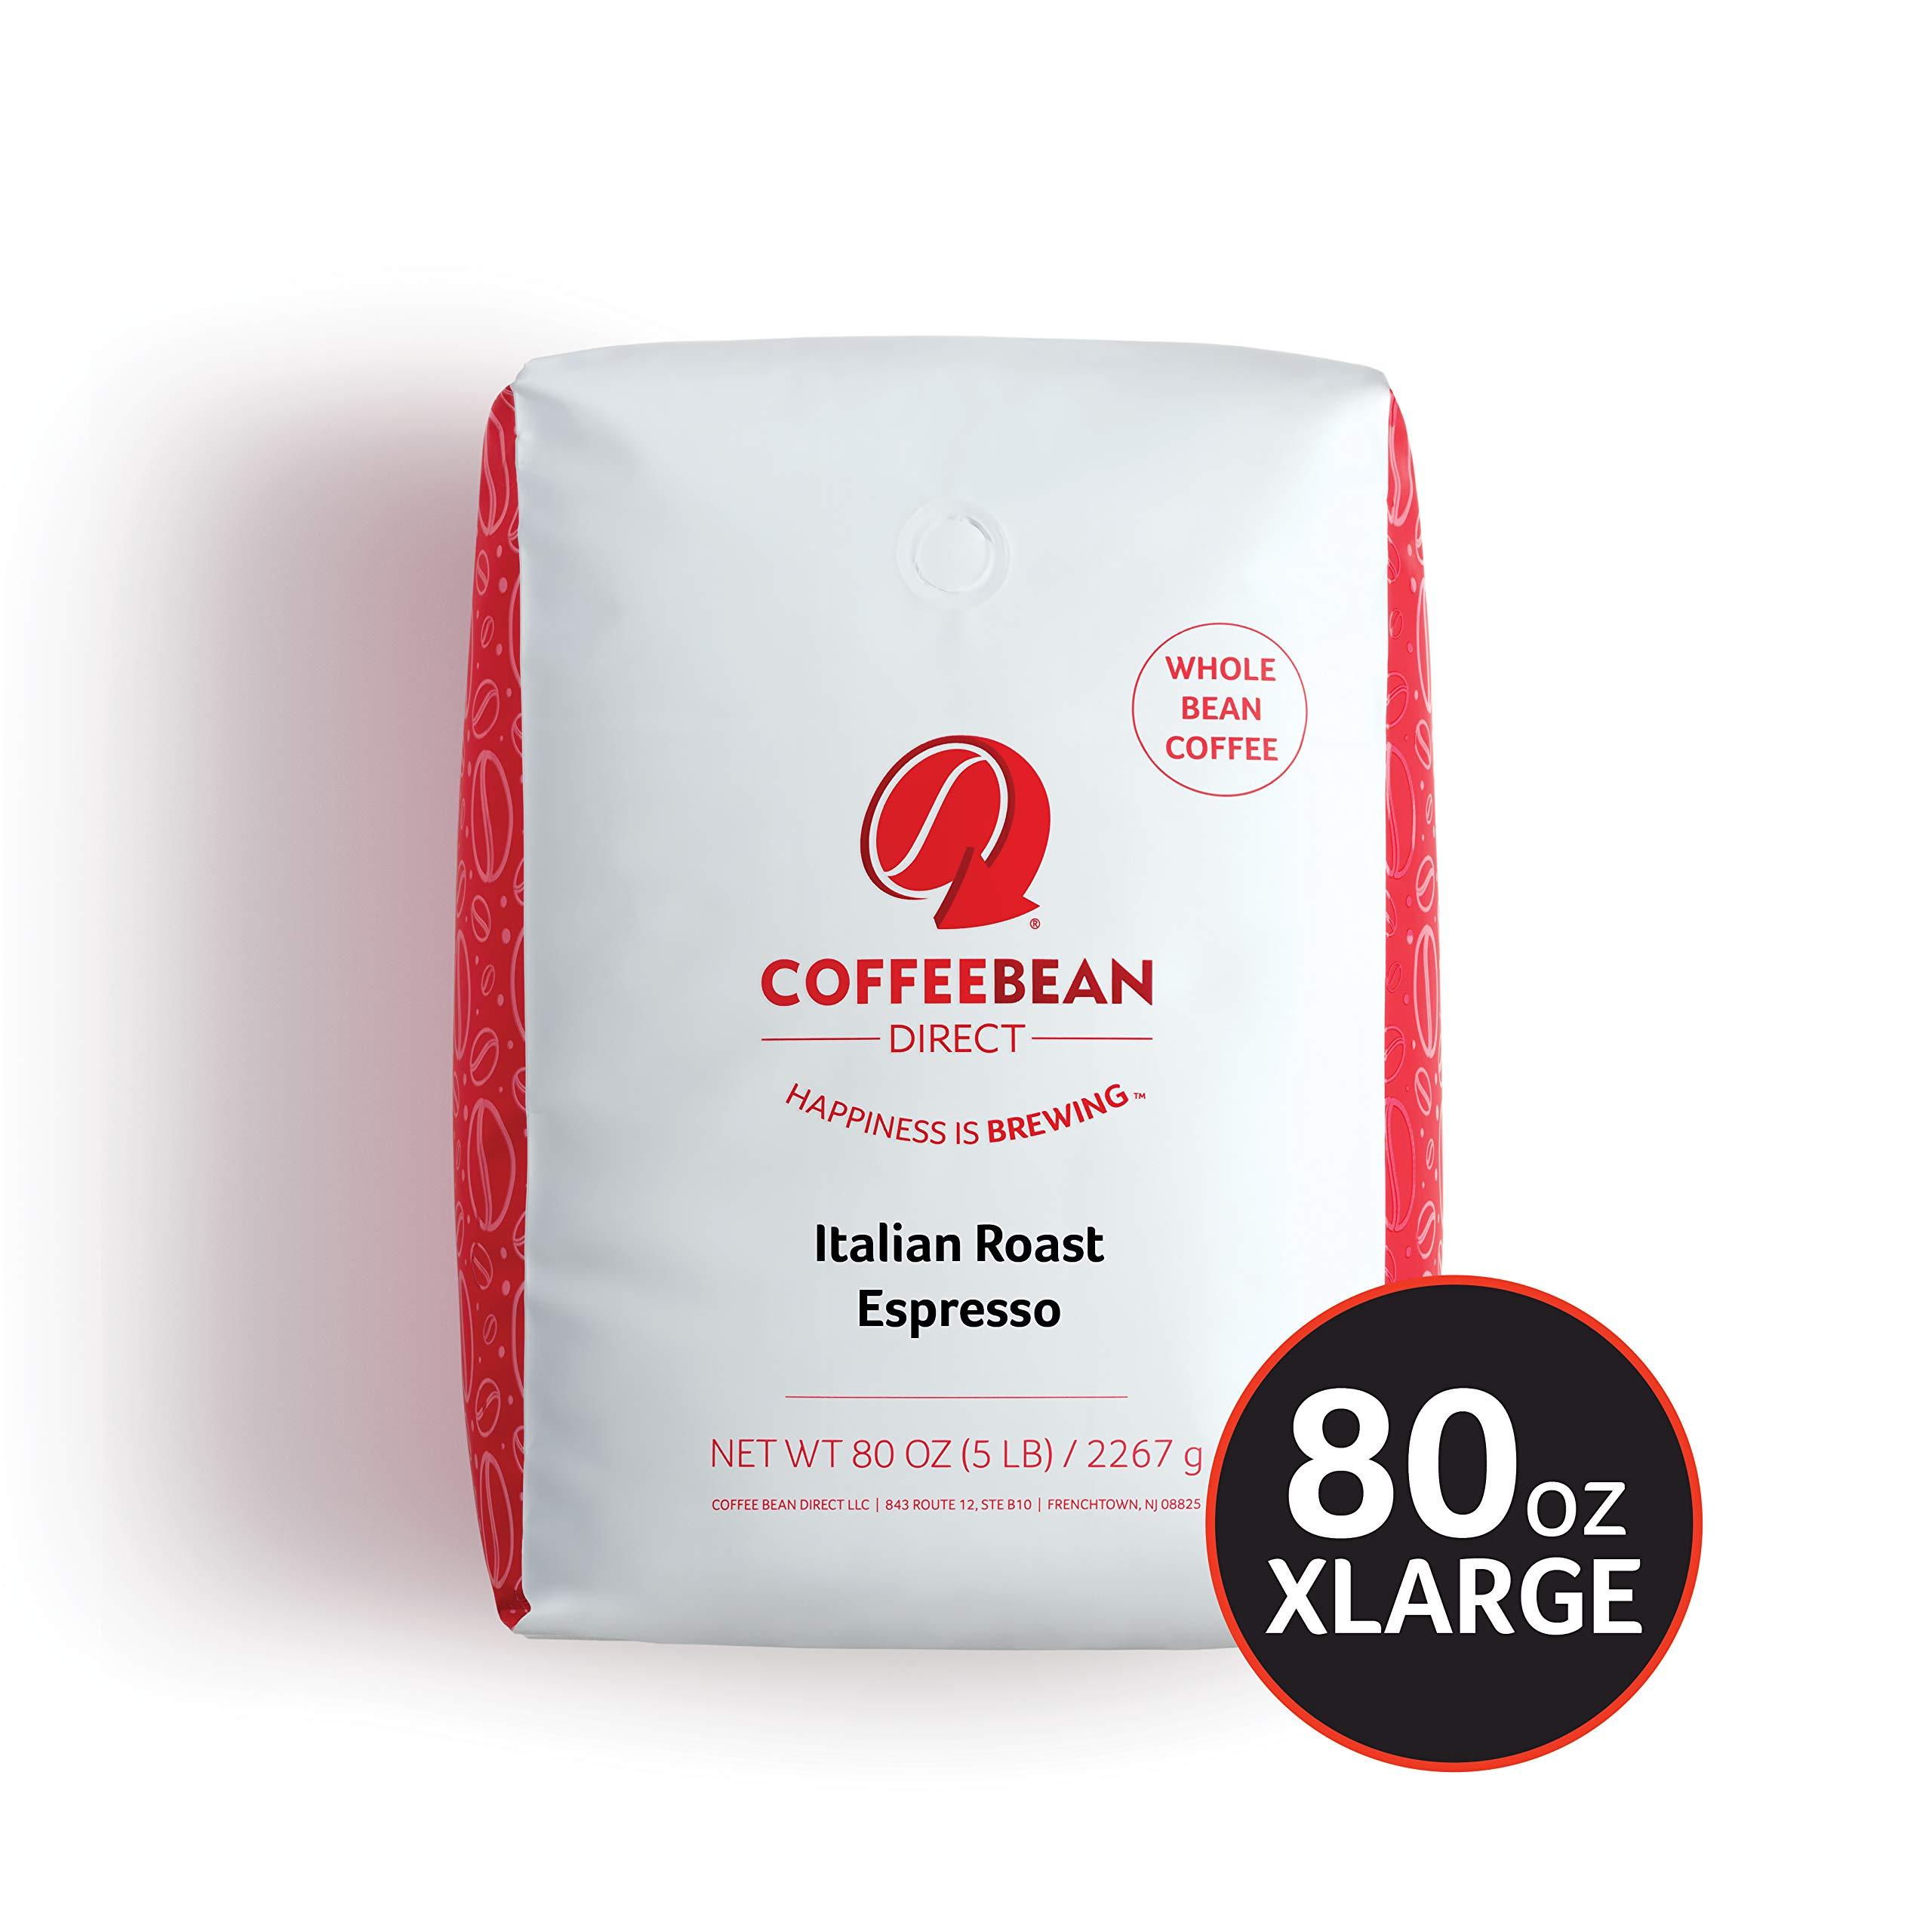 Coffee Bean Direct Italian Roast Espresso, Whole Bean Coffee, 5-Pound Bag by Coffee Bean Direct